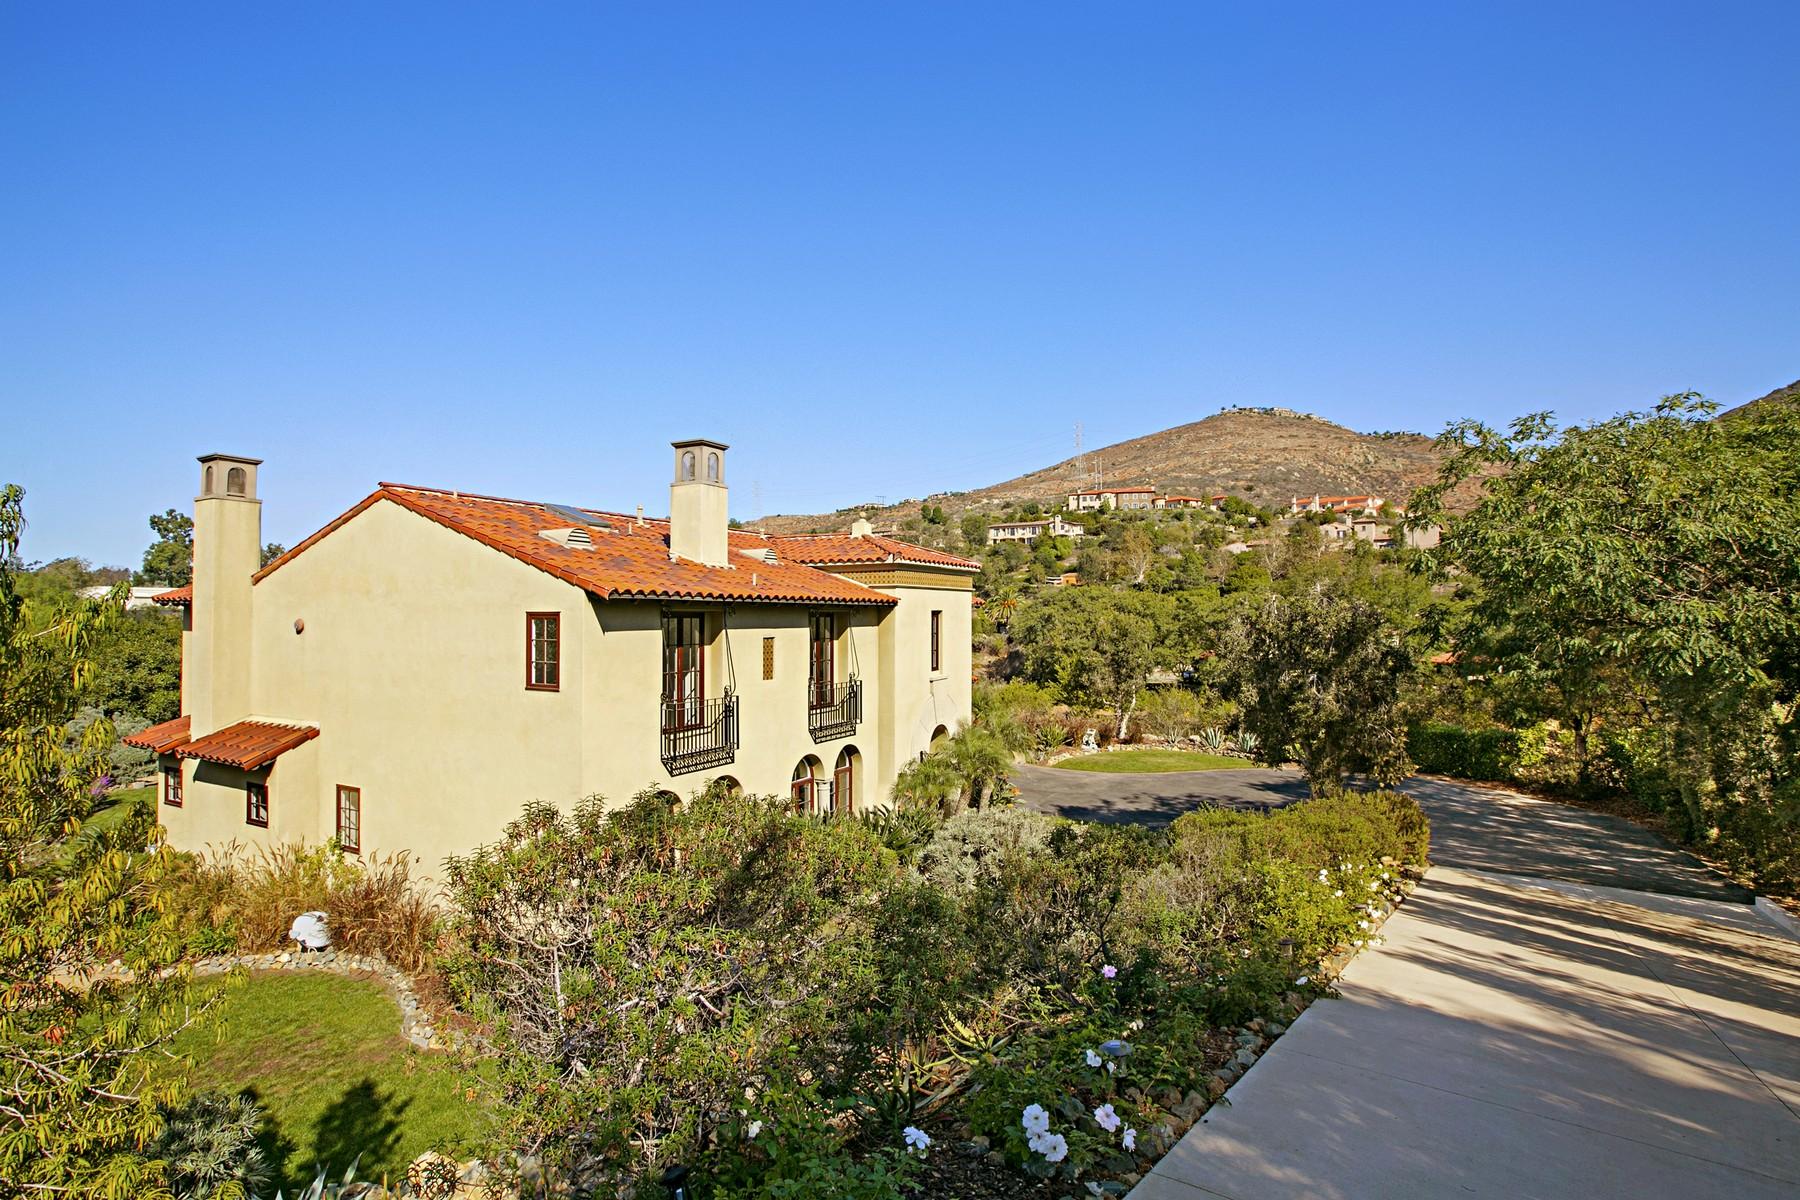 Single Family Home for Sale at 7718 La Orquidia Rancho Santa Fe, California 92067 United States